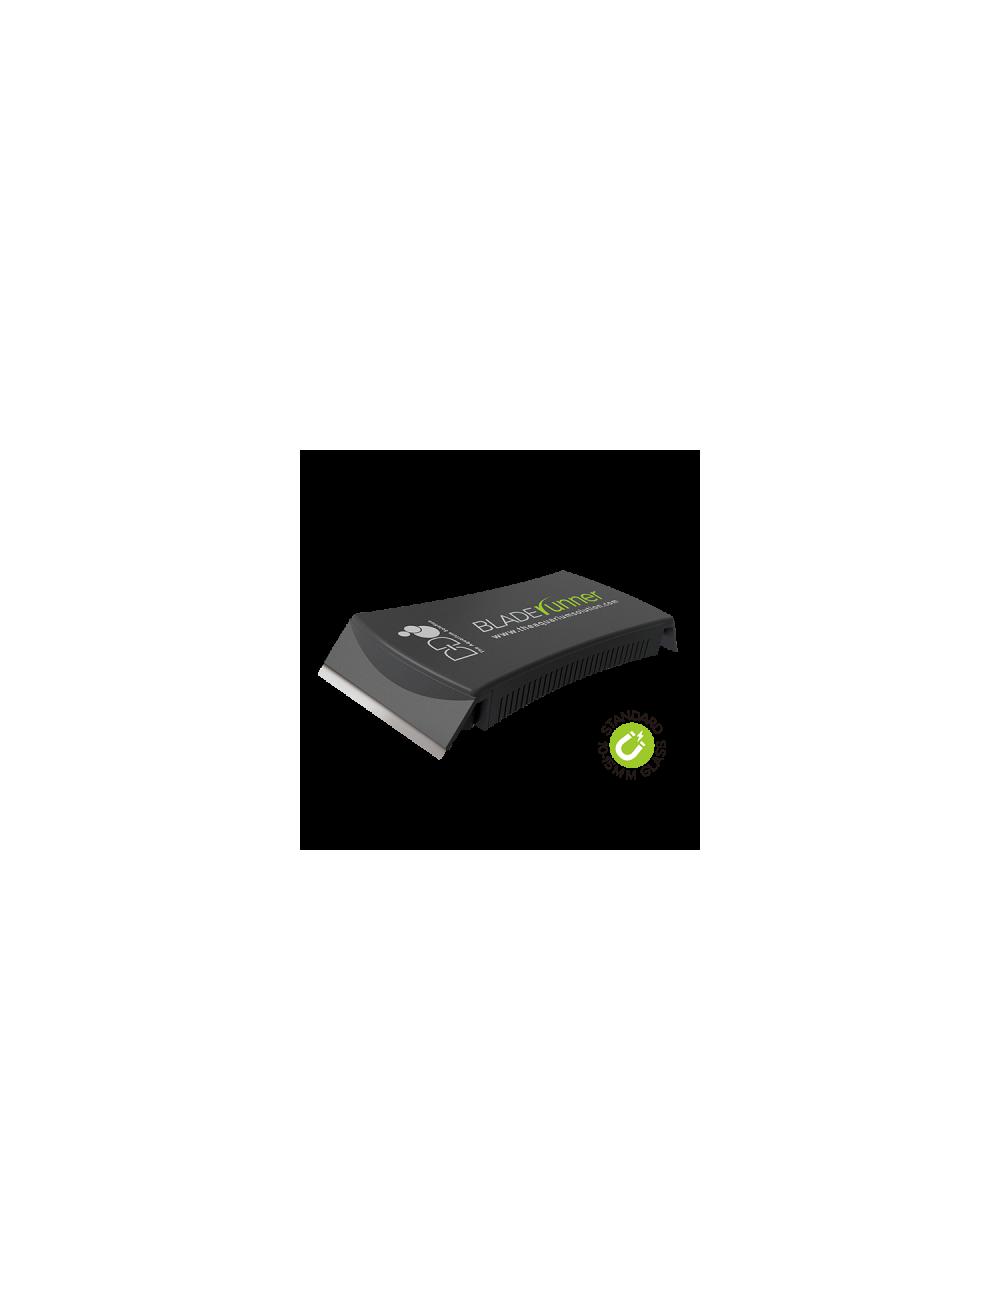 D-D - BladeRunner Magnet cleaner - Standard (10-15 mm) - Aimant de nettoyage ultra-mince